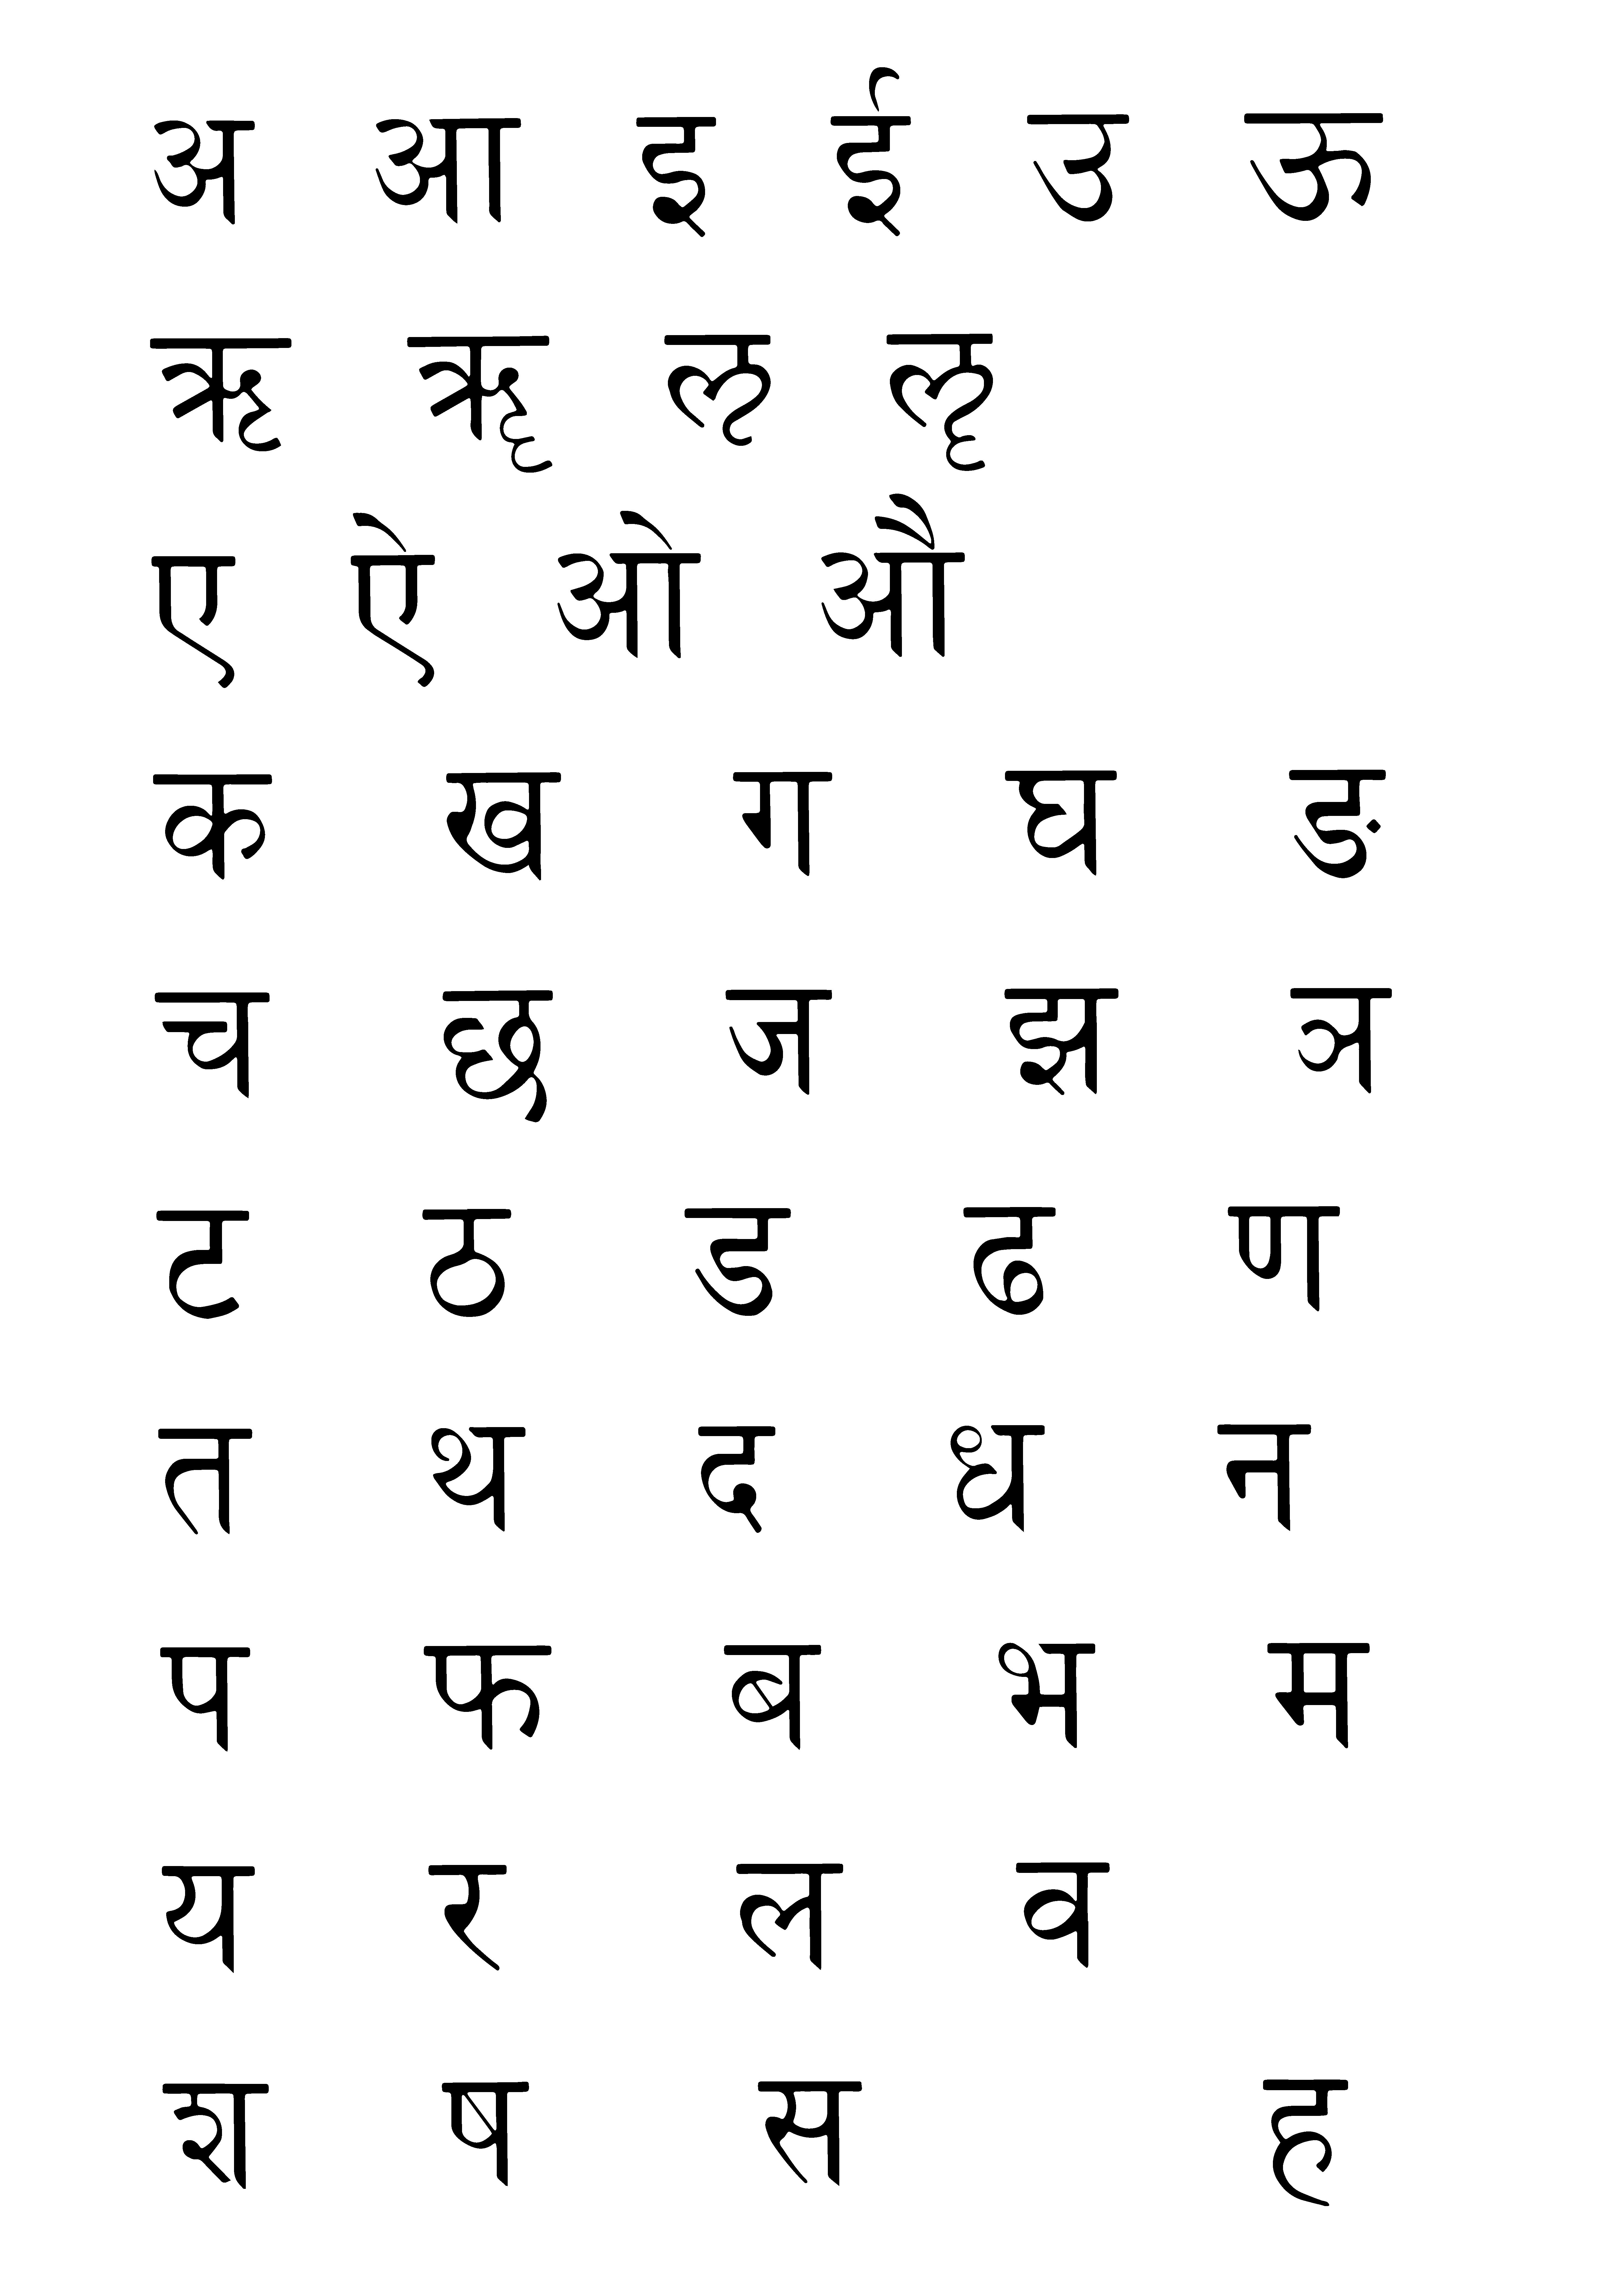 devanagari-bwi